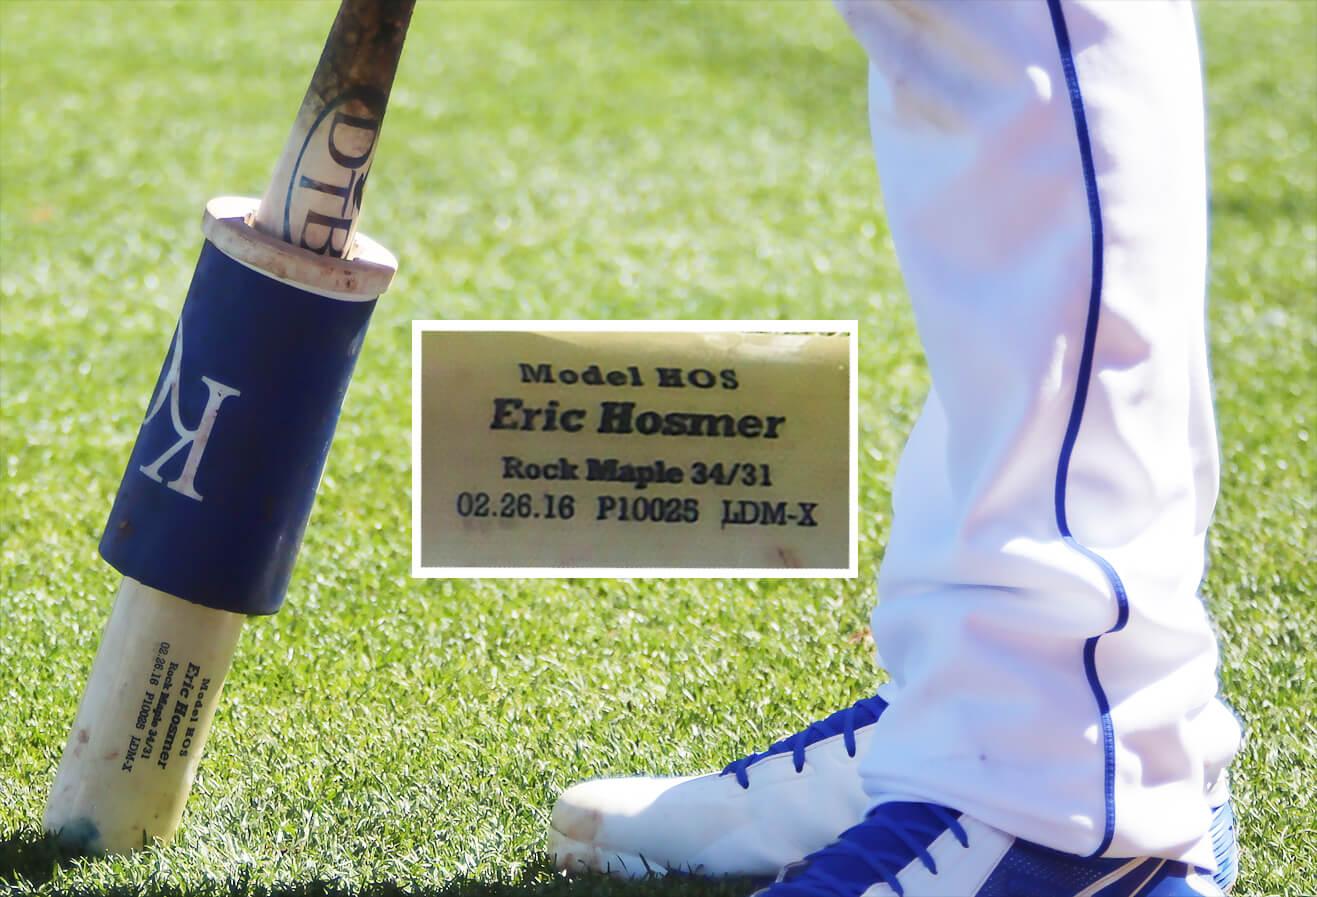 Eric Hosmer DTB HOS Bat